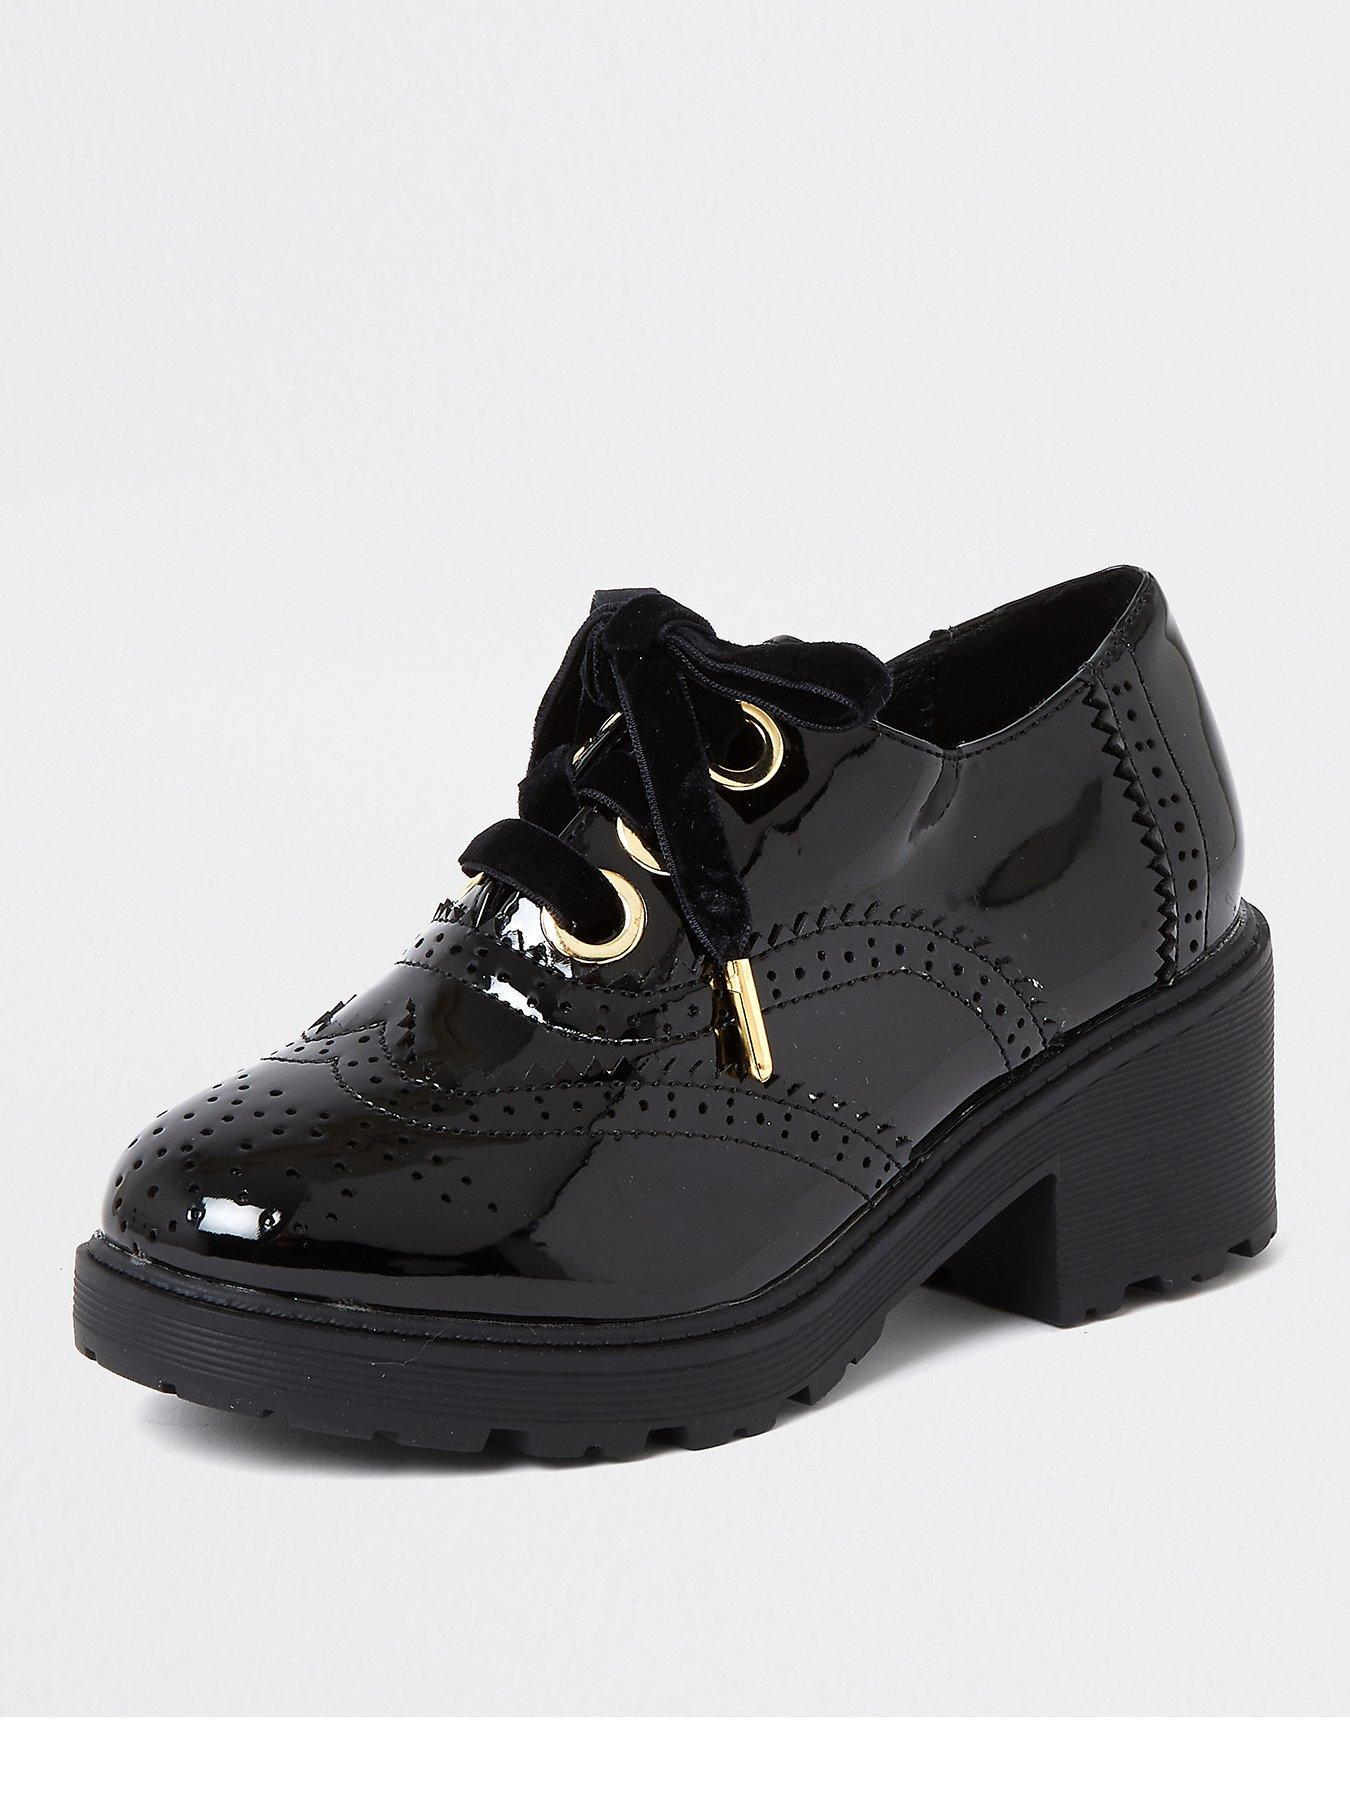 Kids Shoes   River Island Kids Boots